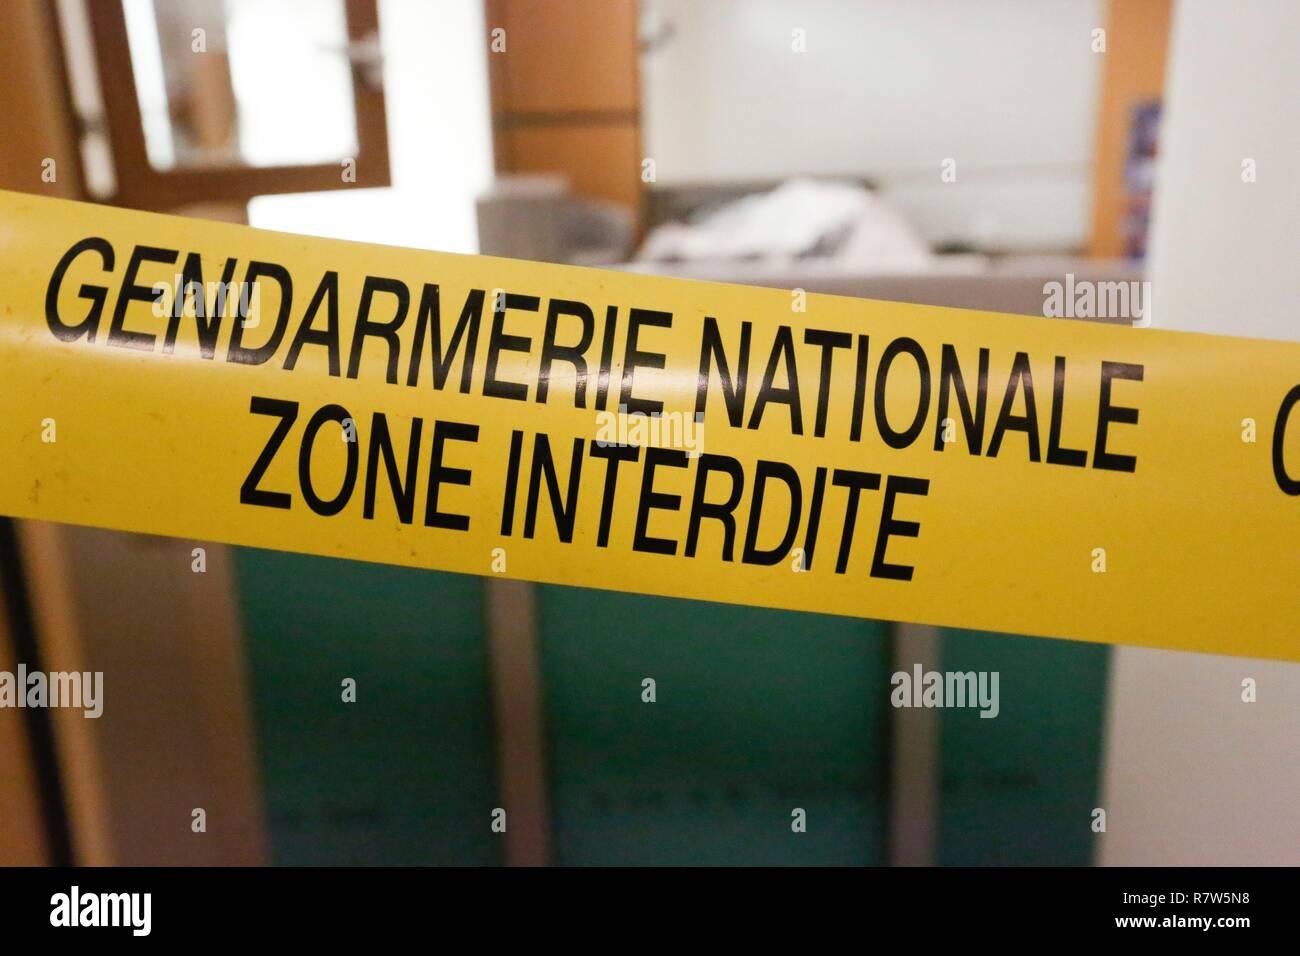 France, Val d'Oise, Pontoise, Criminal Investigation Institute of the National Gendarmerie - Stock Image